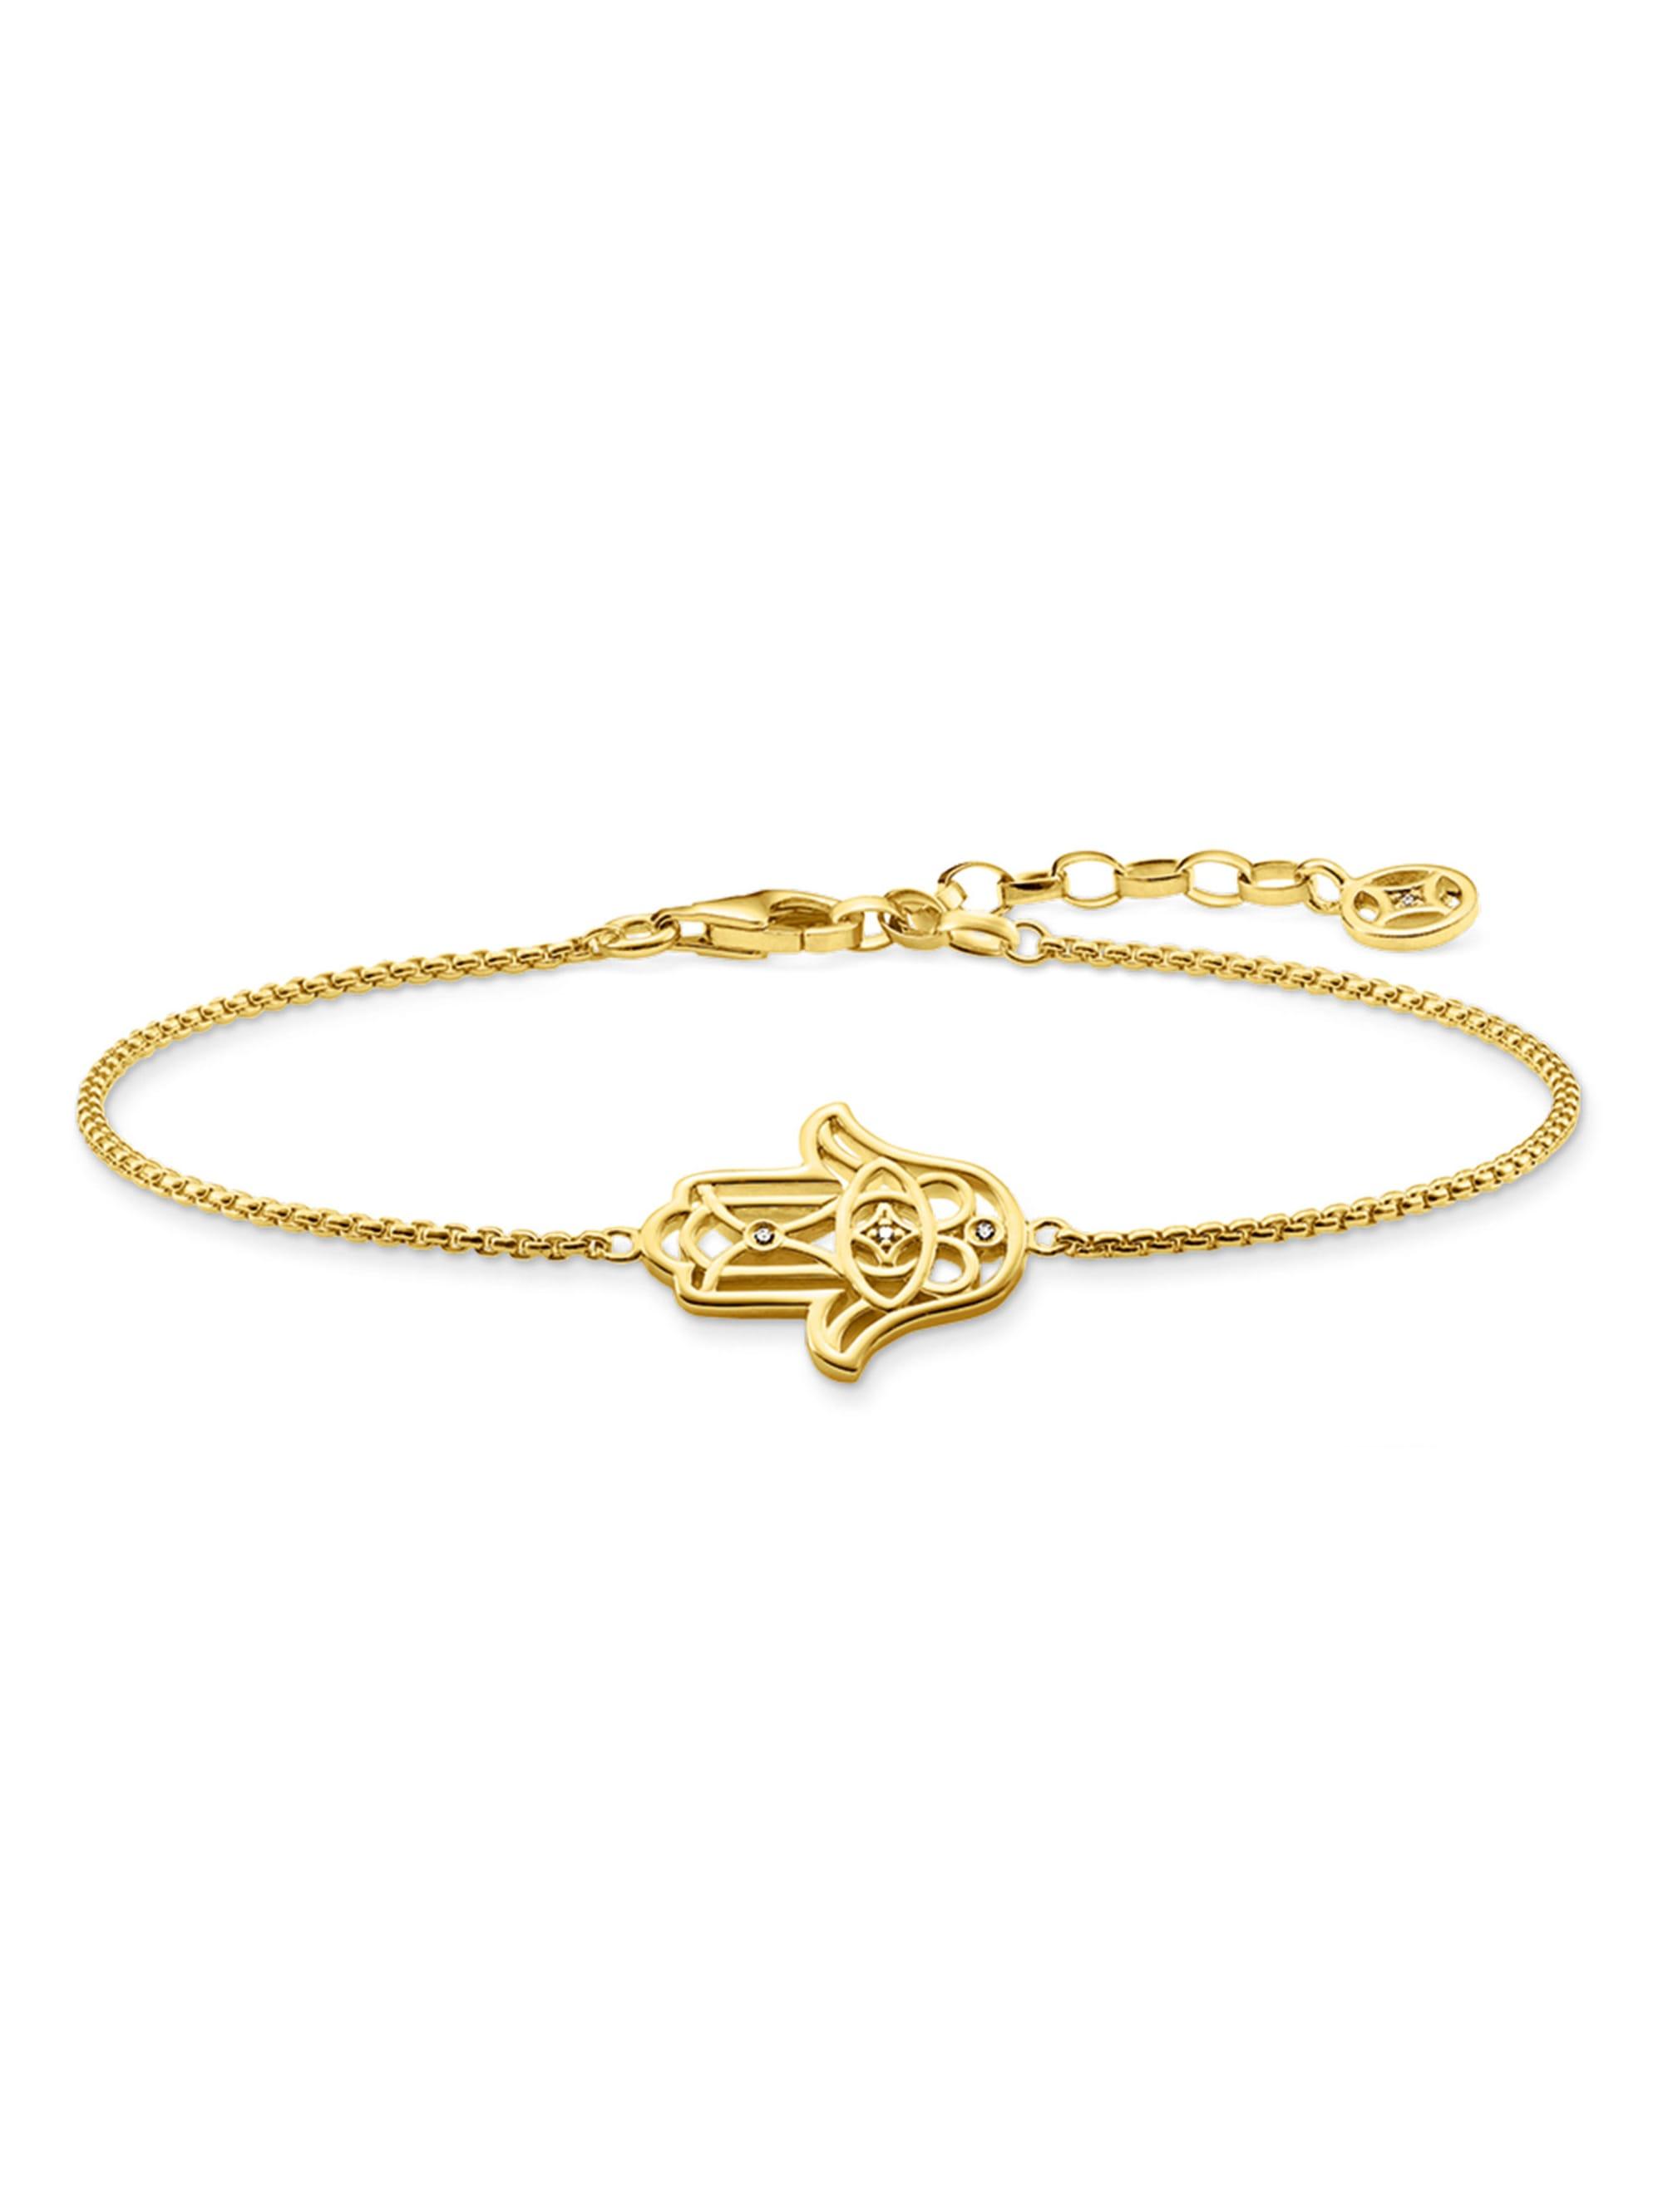 Thomas Sabo Armband mit Diamanten D A0020-924-39-L19 C5n50